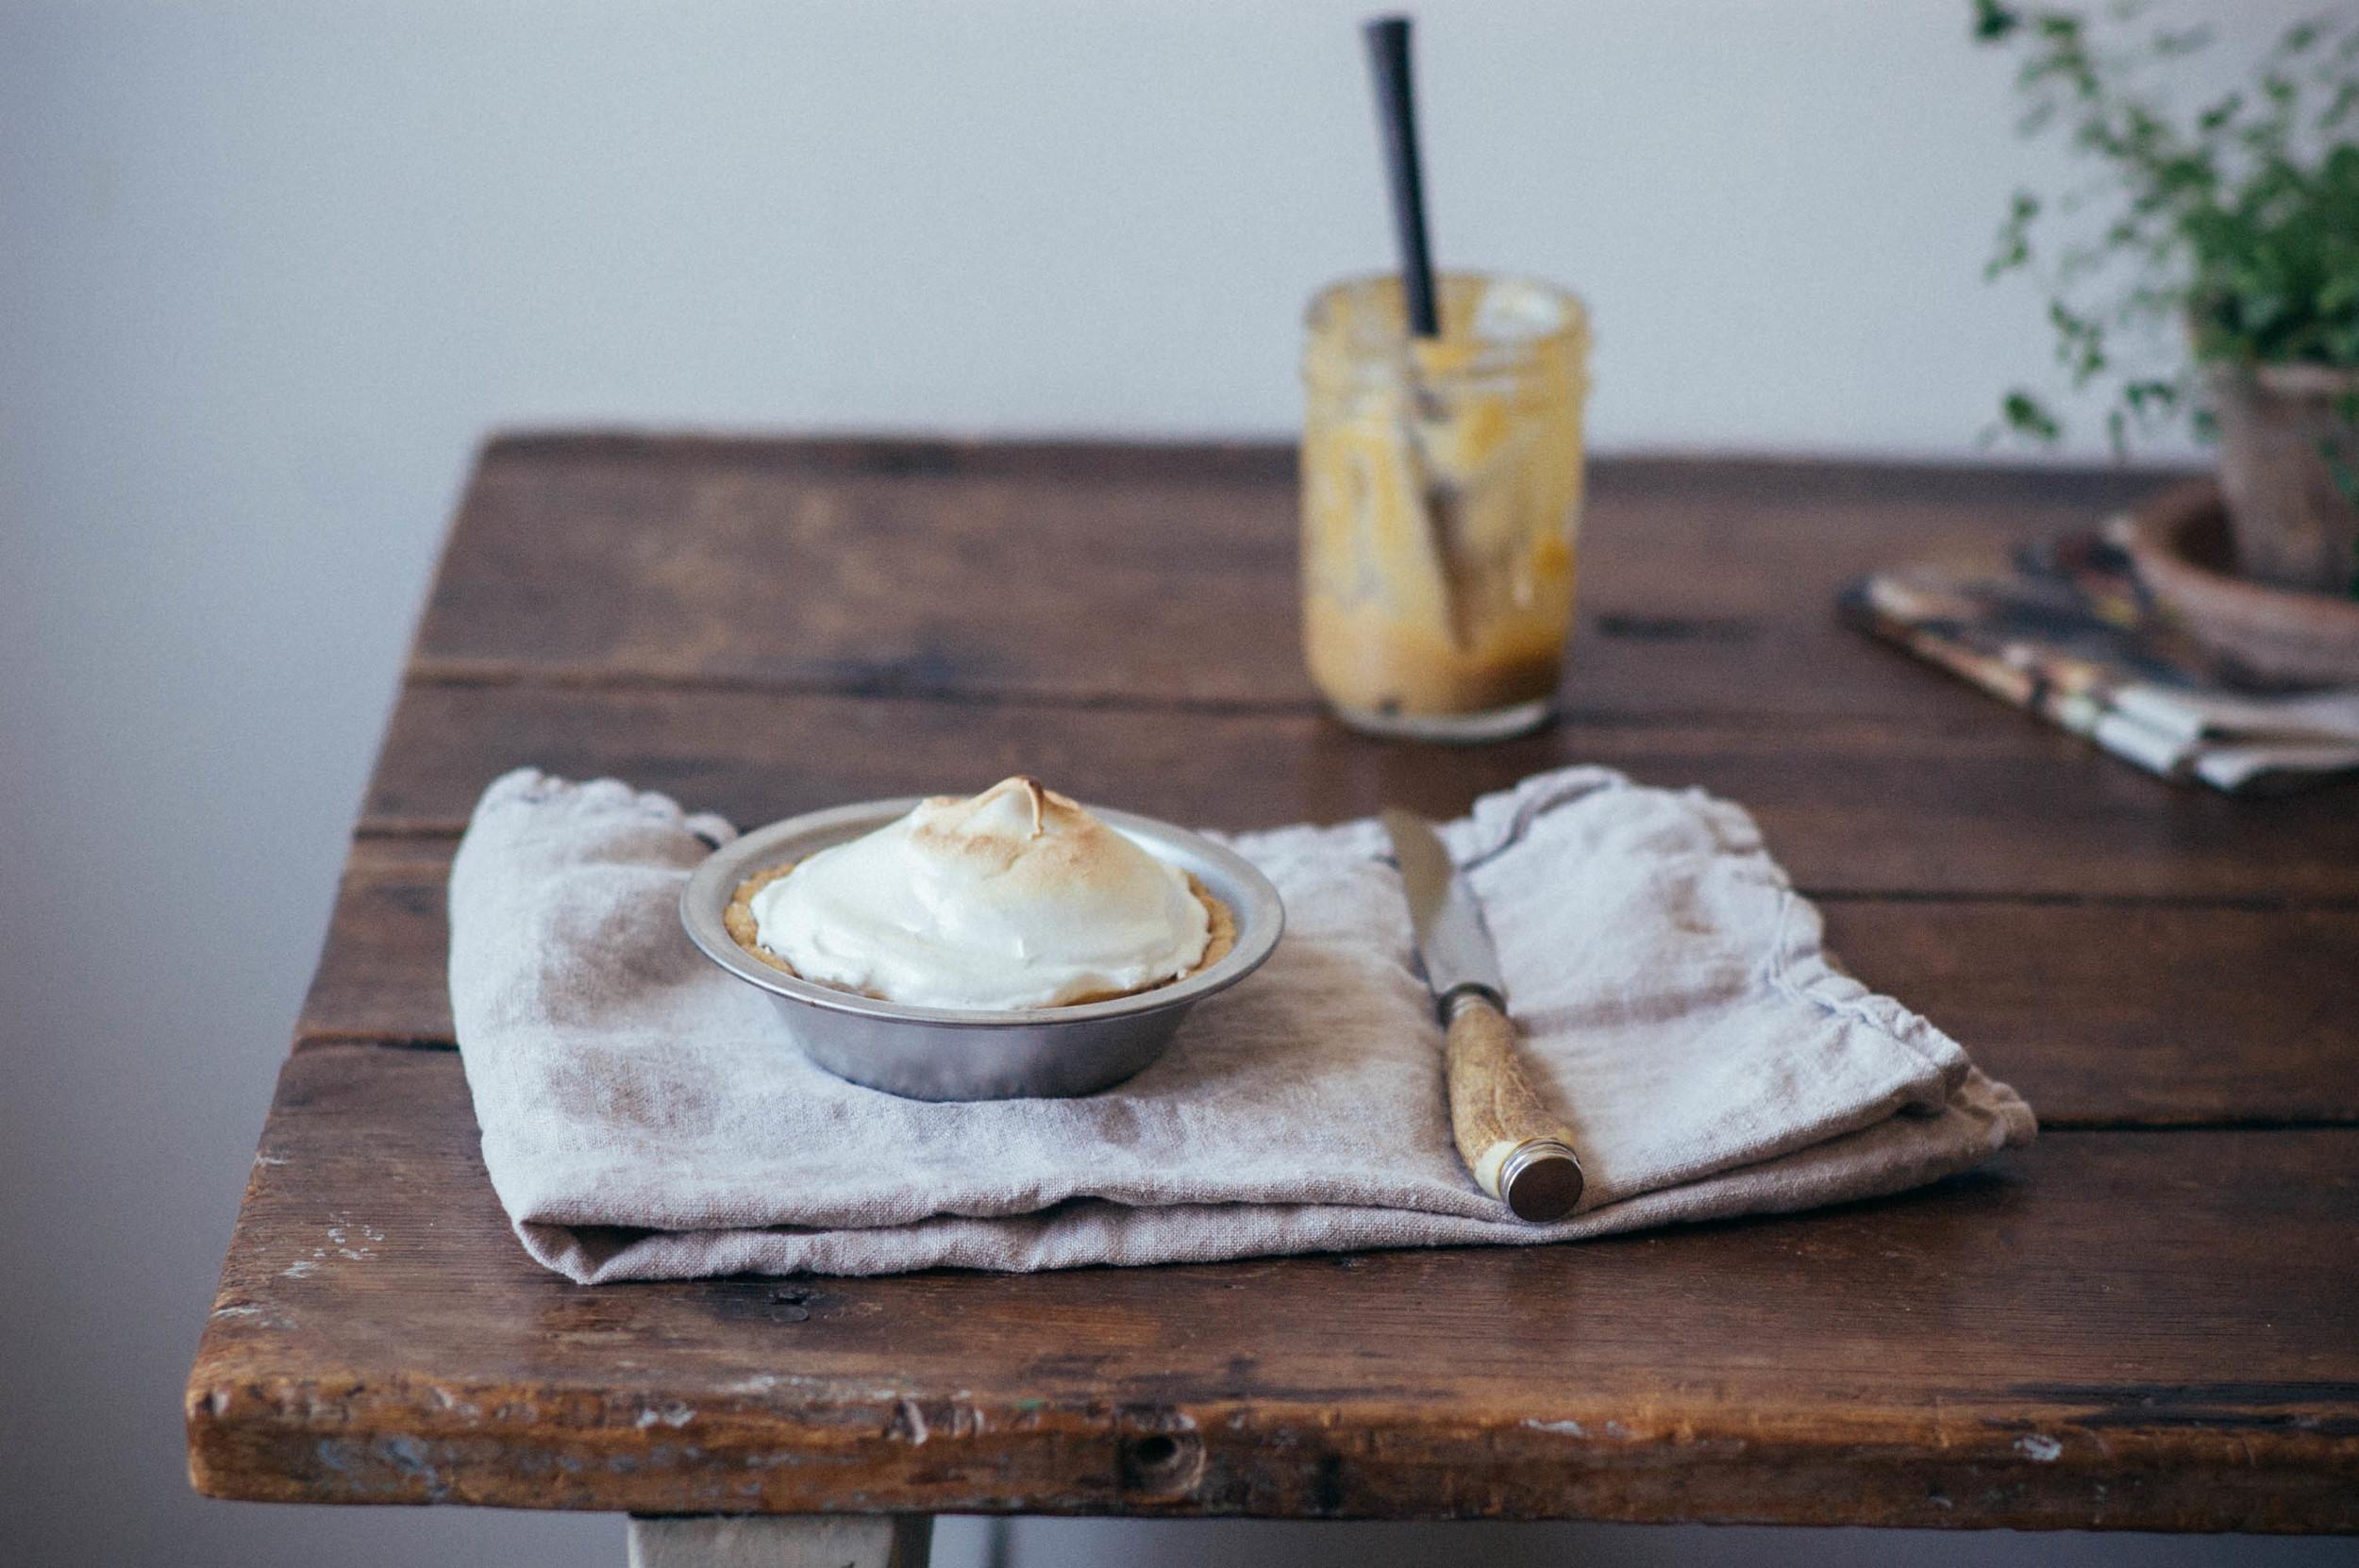 Rhubarb meringue tarts